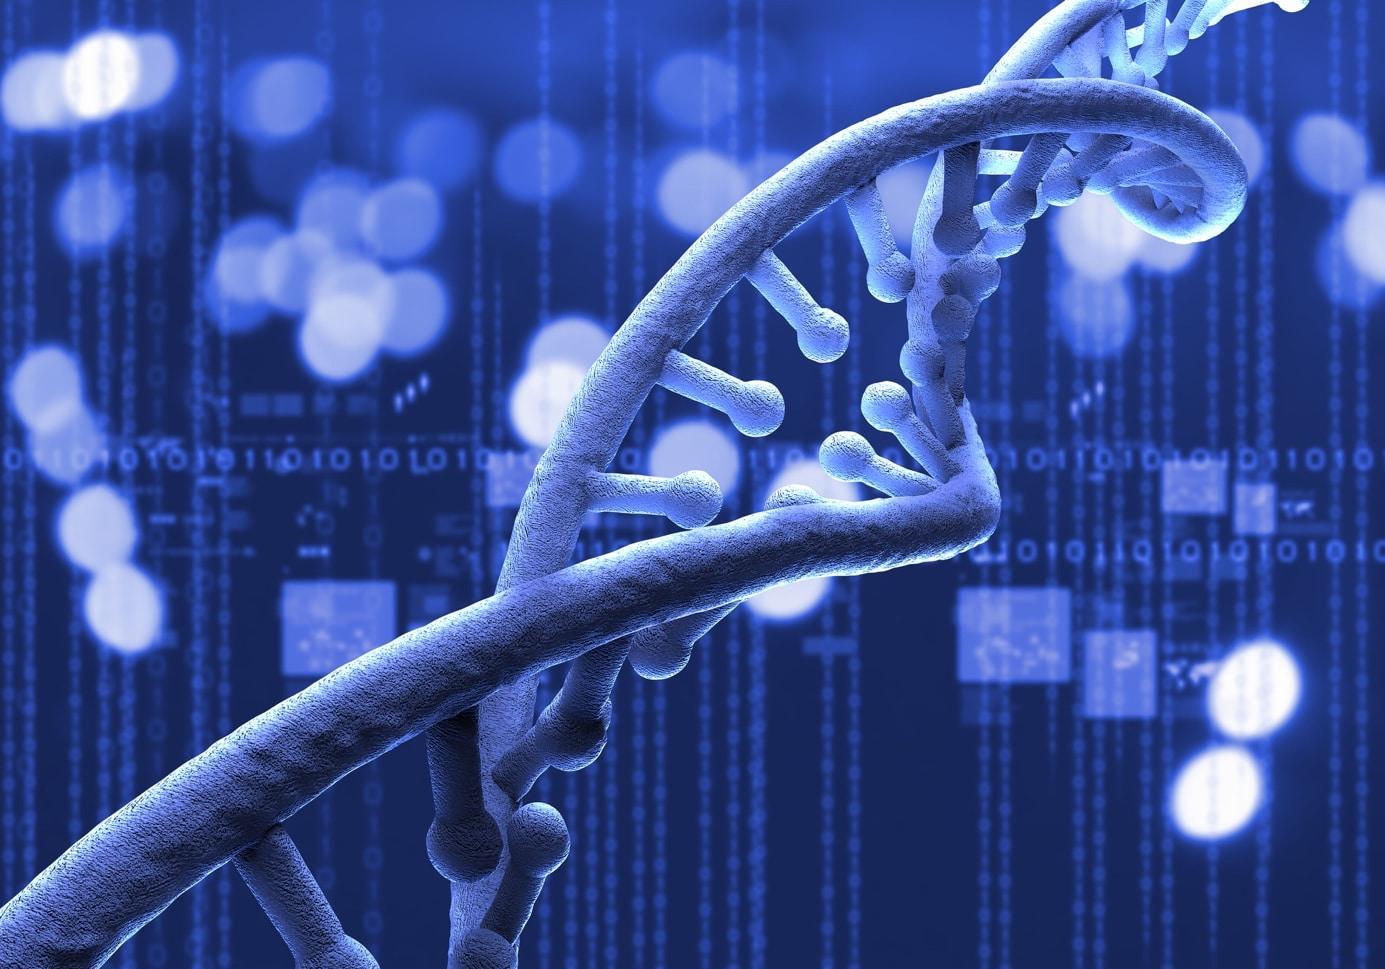 ADN masculin et féminin: ce qui nous différencie